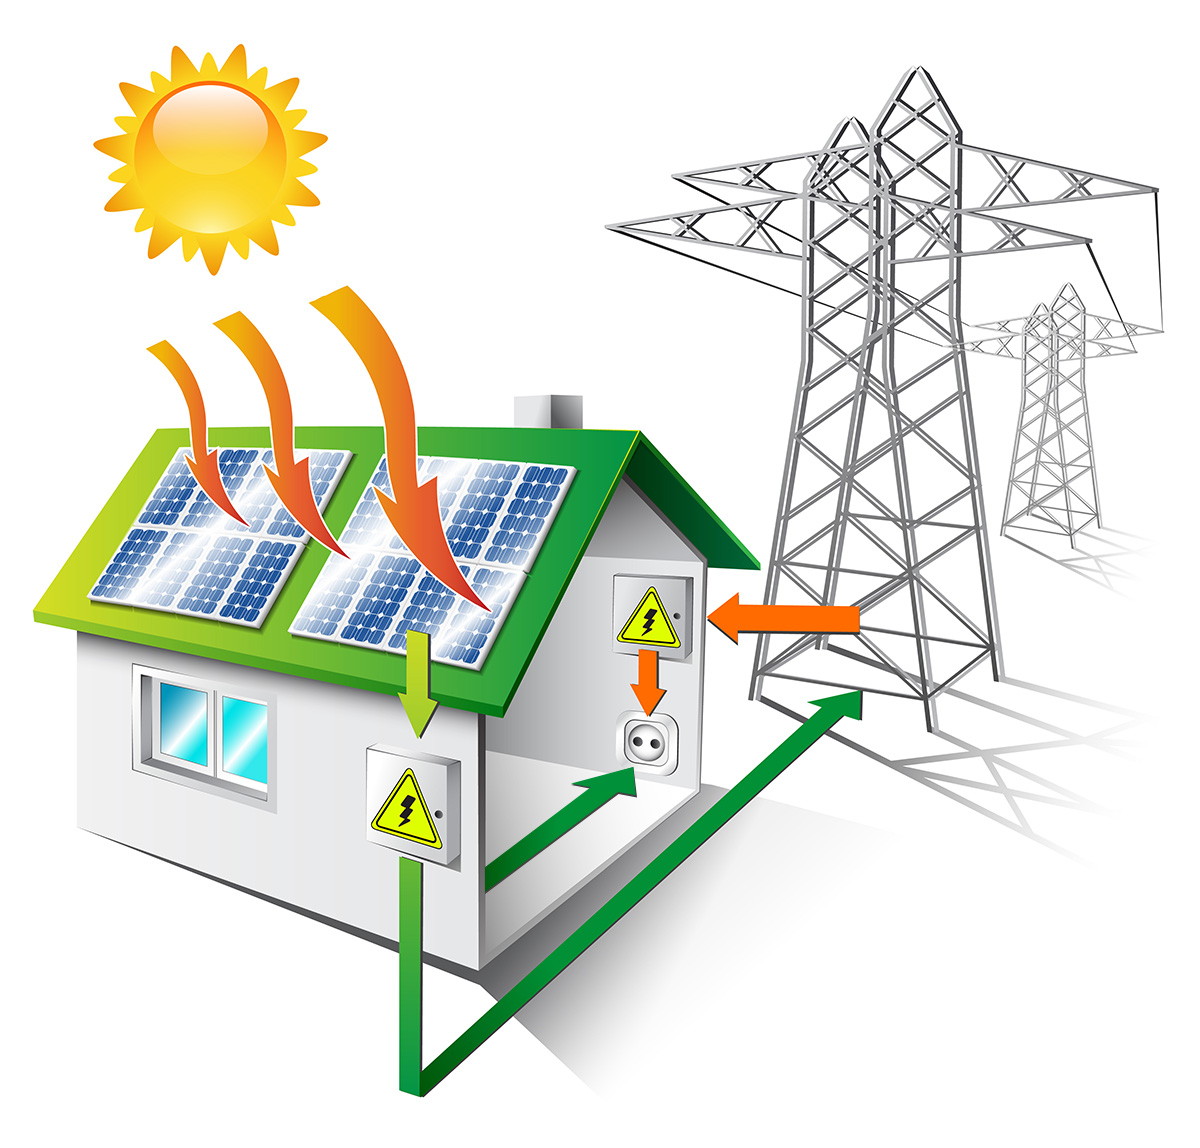 pavento solar werking zonnepanelen